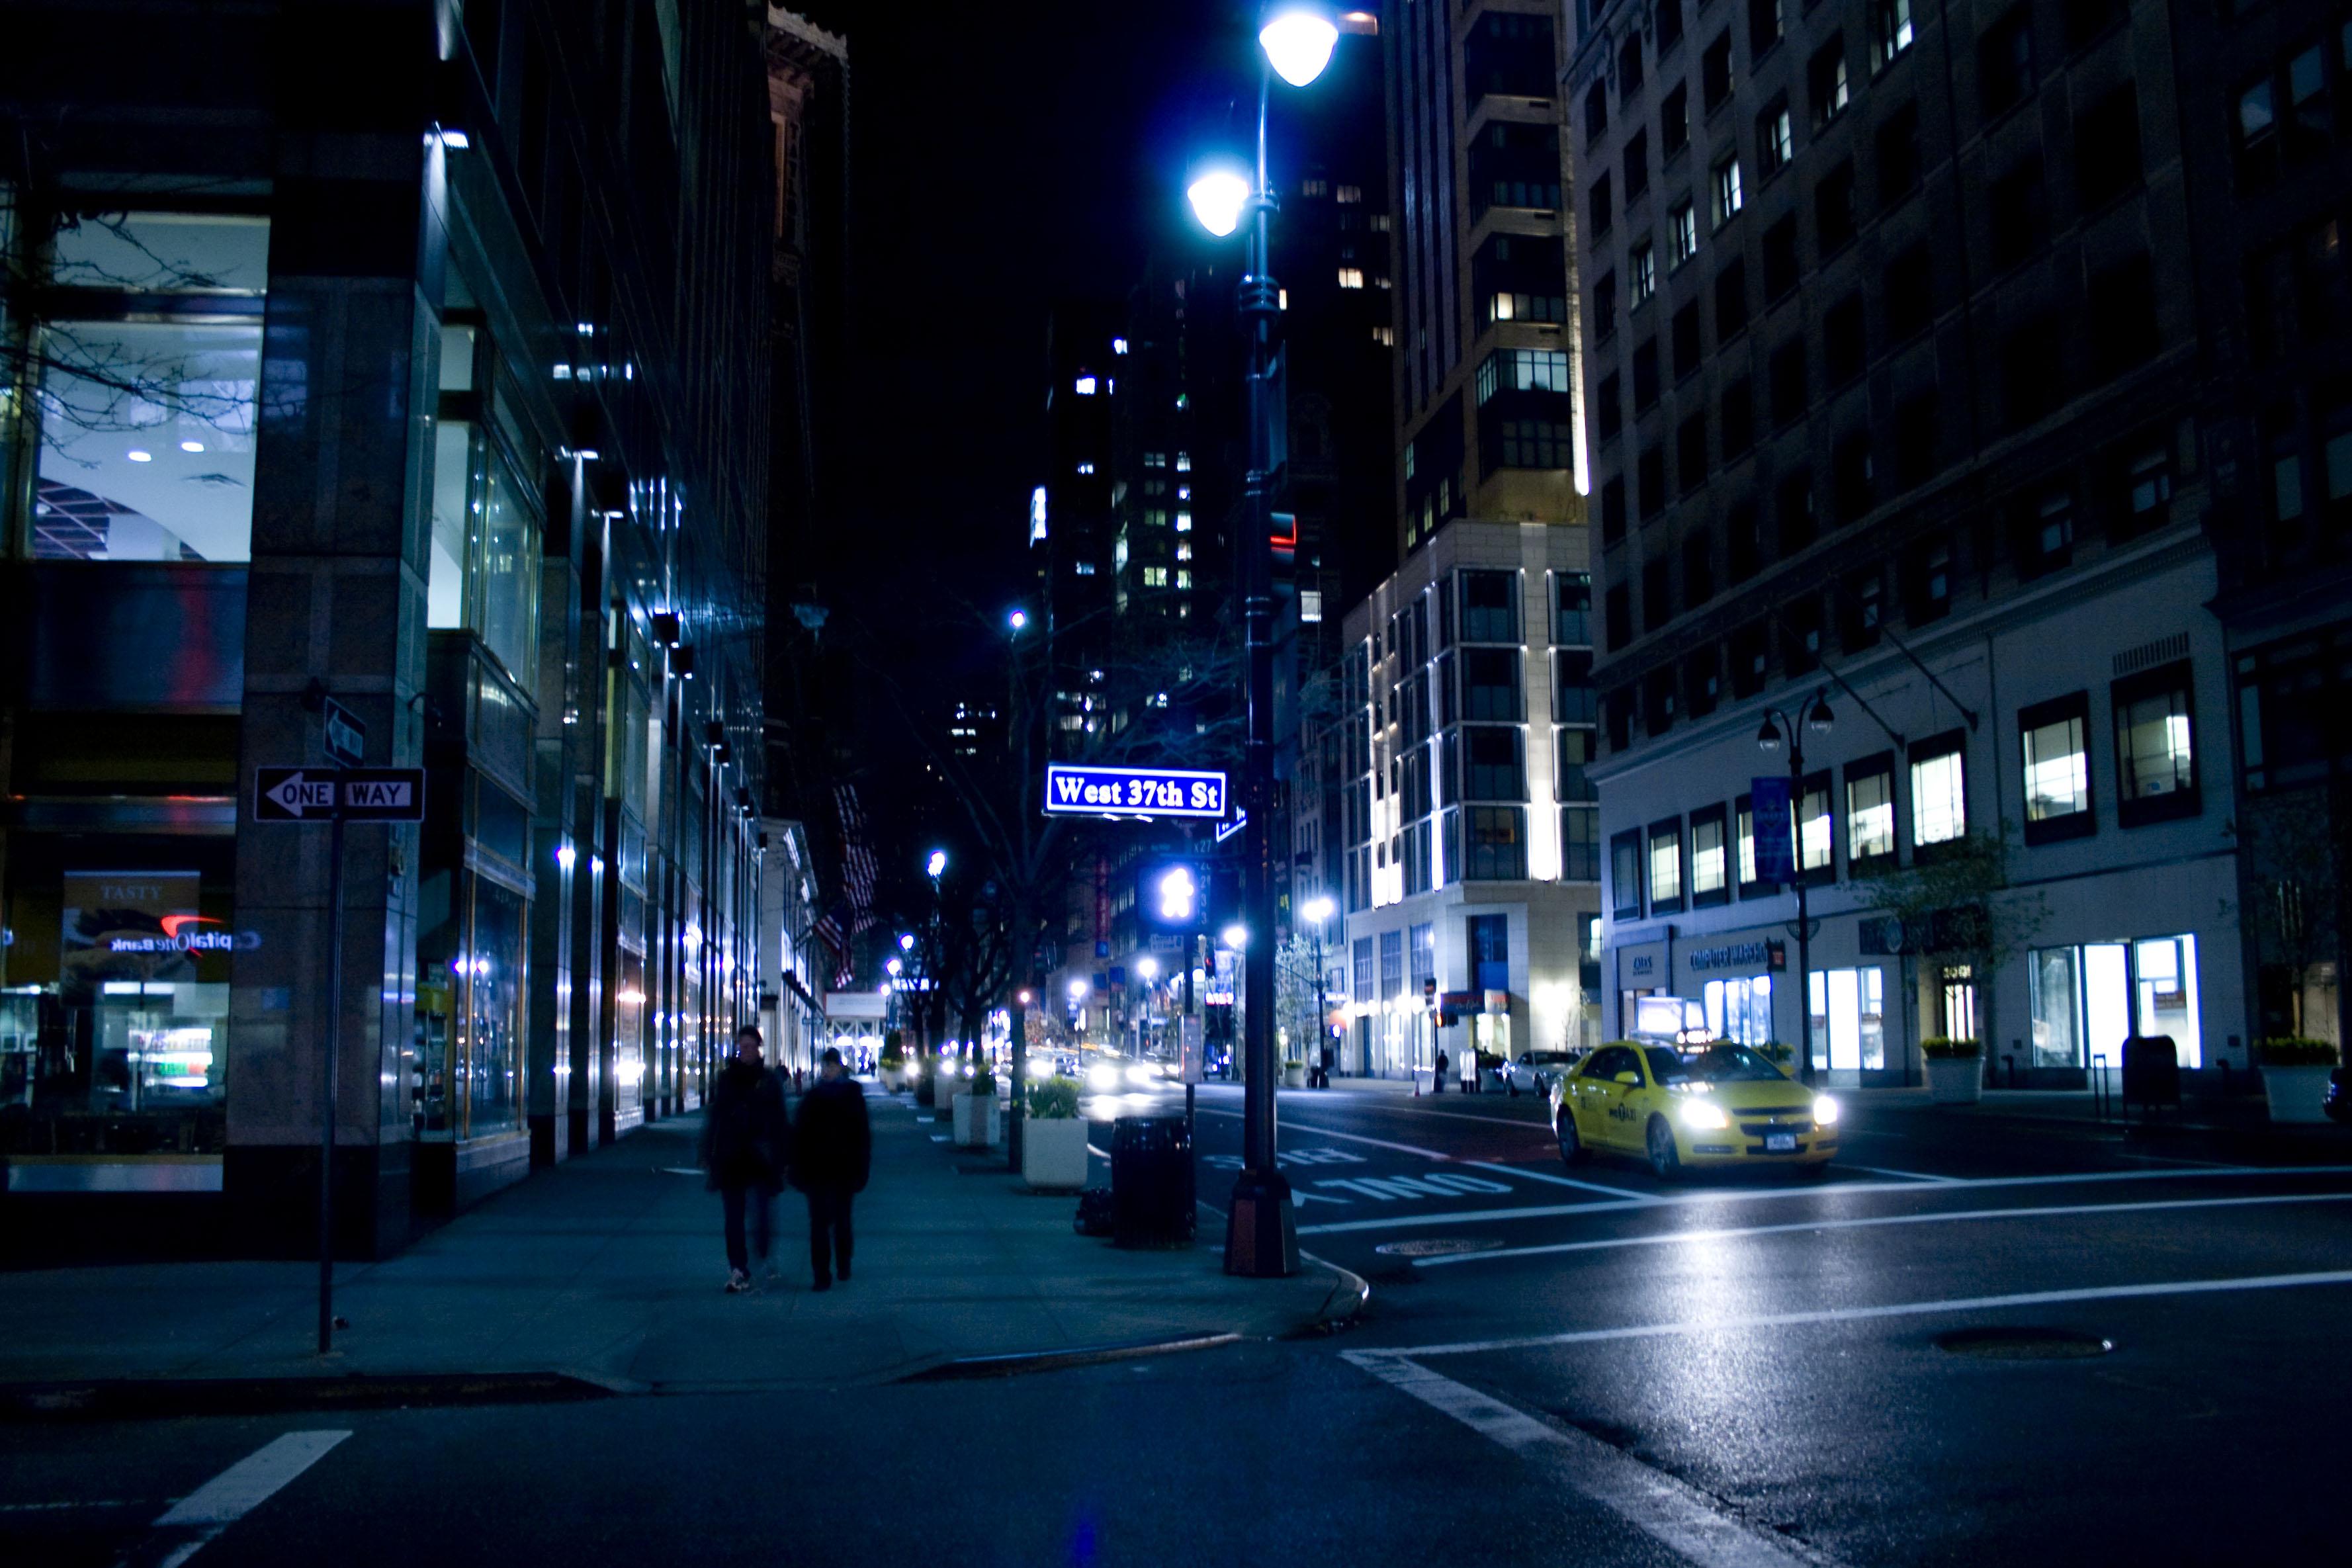 Man walking down the street at night